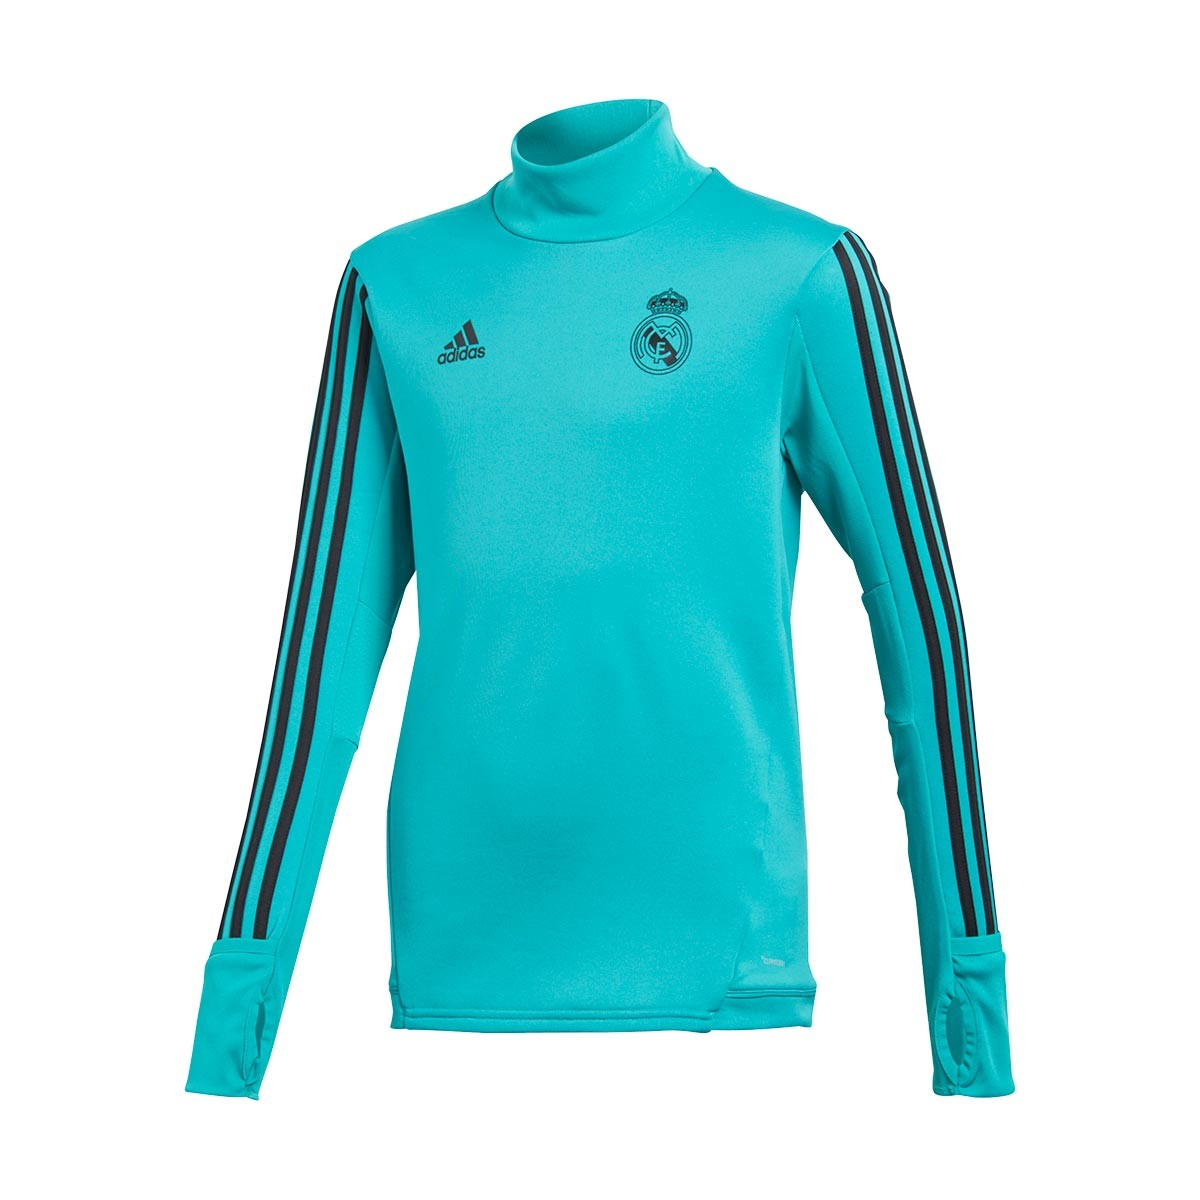 3dfefd4029c Sudadera adidas Real Madrid Training Top 2017-2018 Niño Aero reef-Black -  Tienda de fútbol Fútbol Emotion